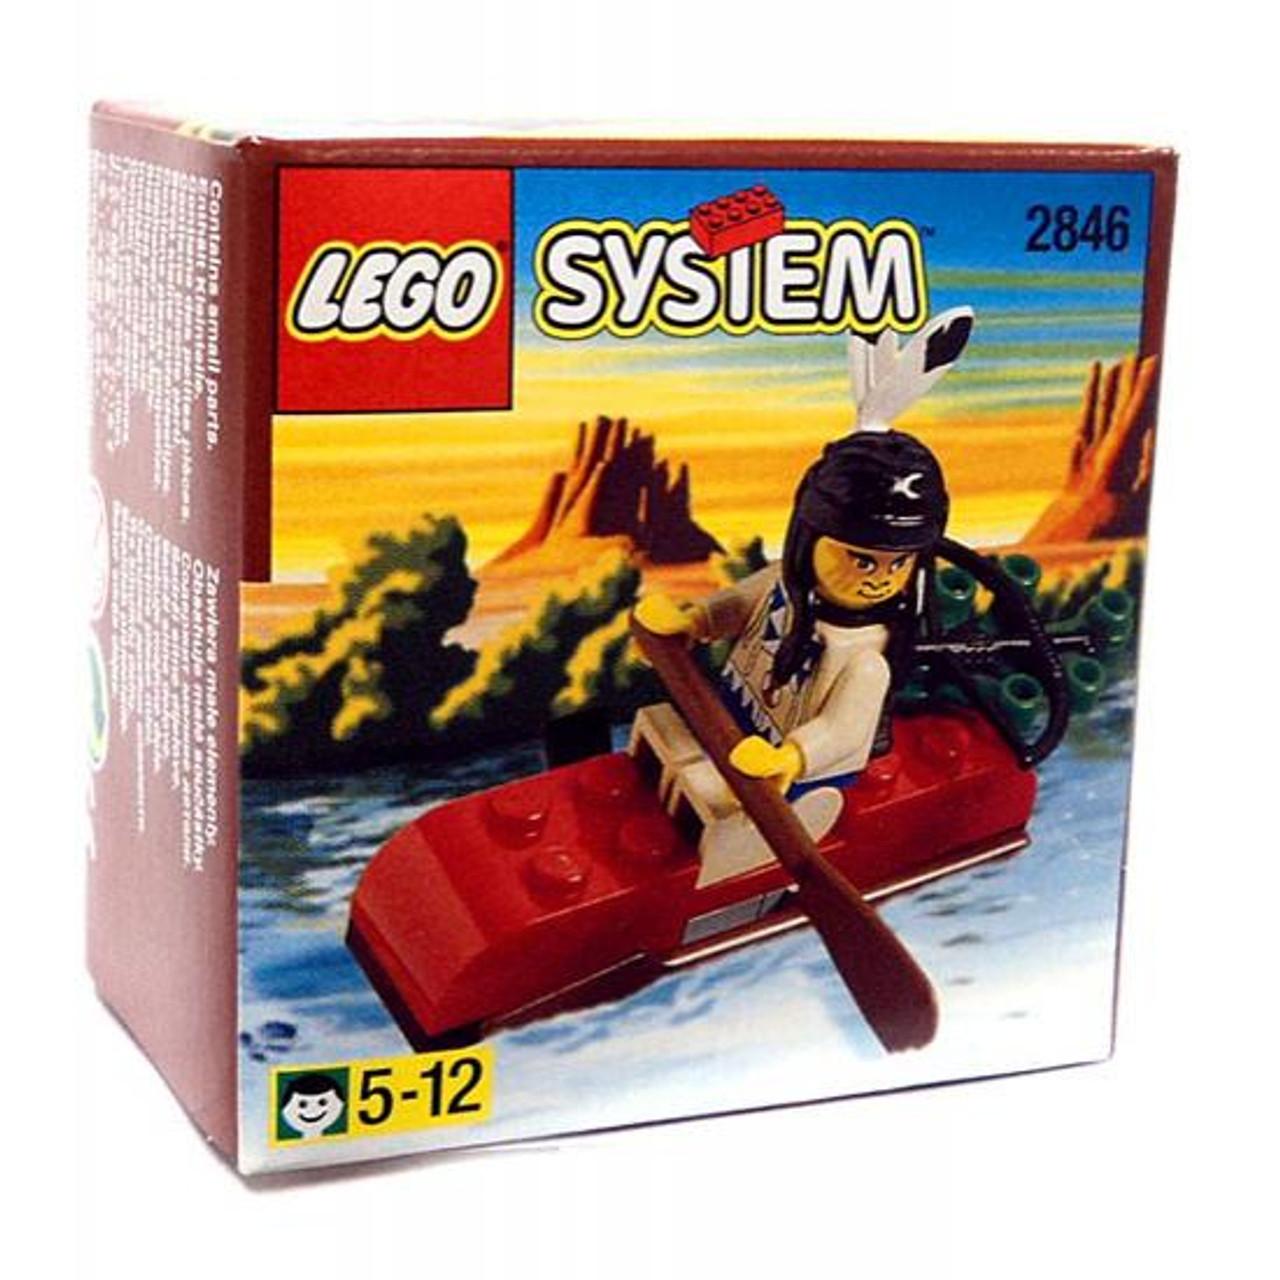 LEGO System Indian Kayak Set #2846